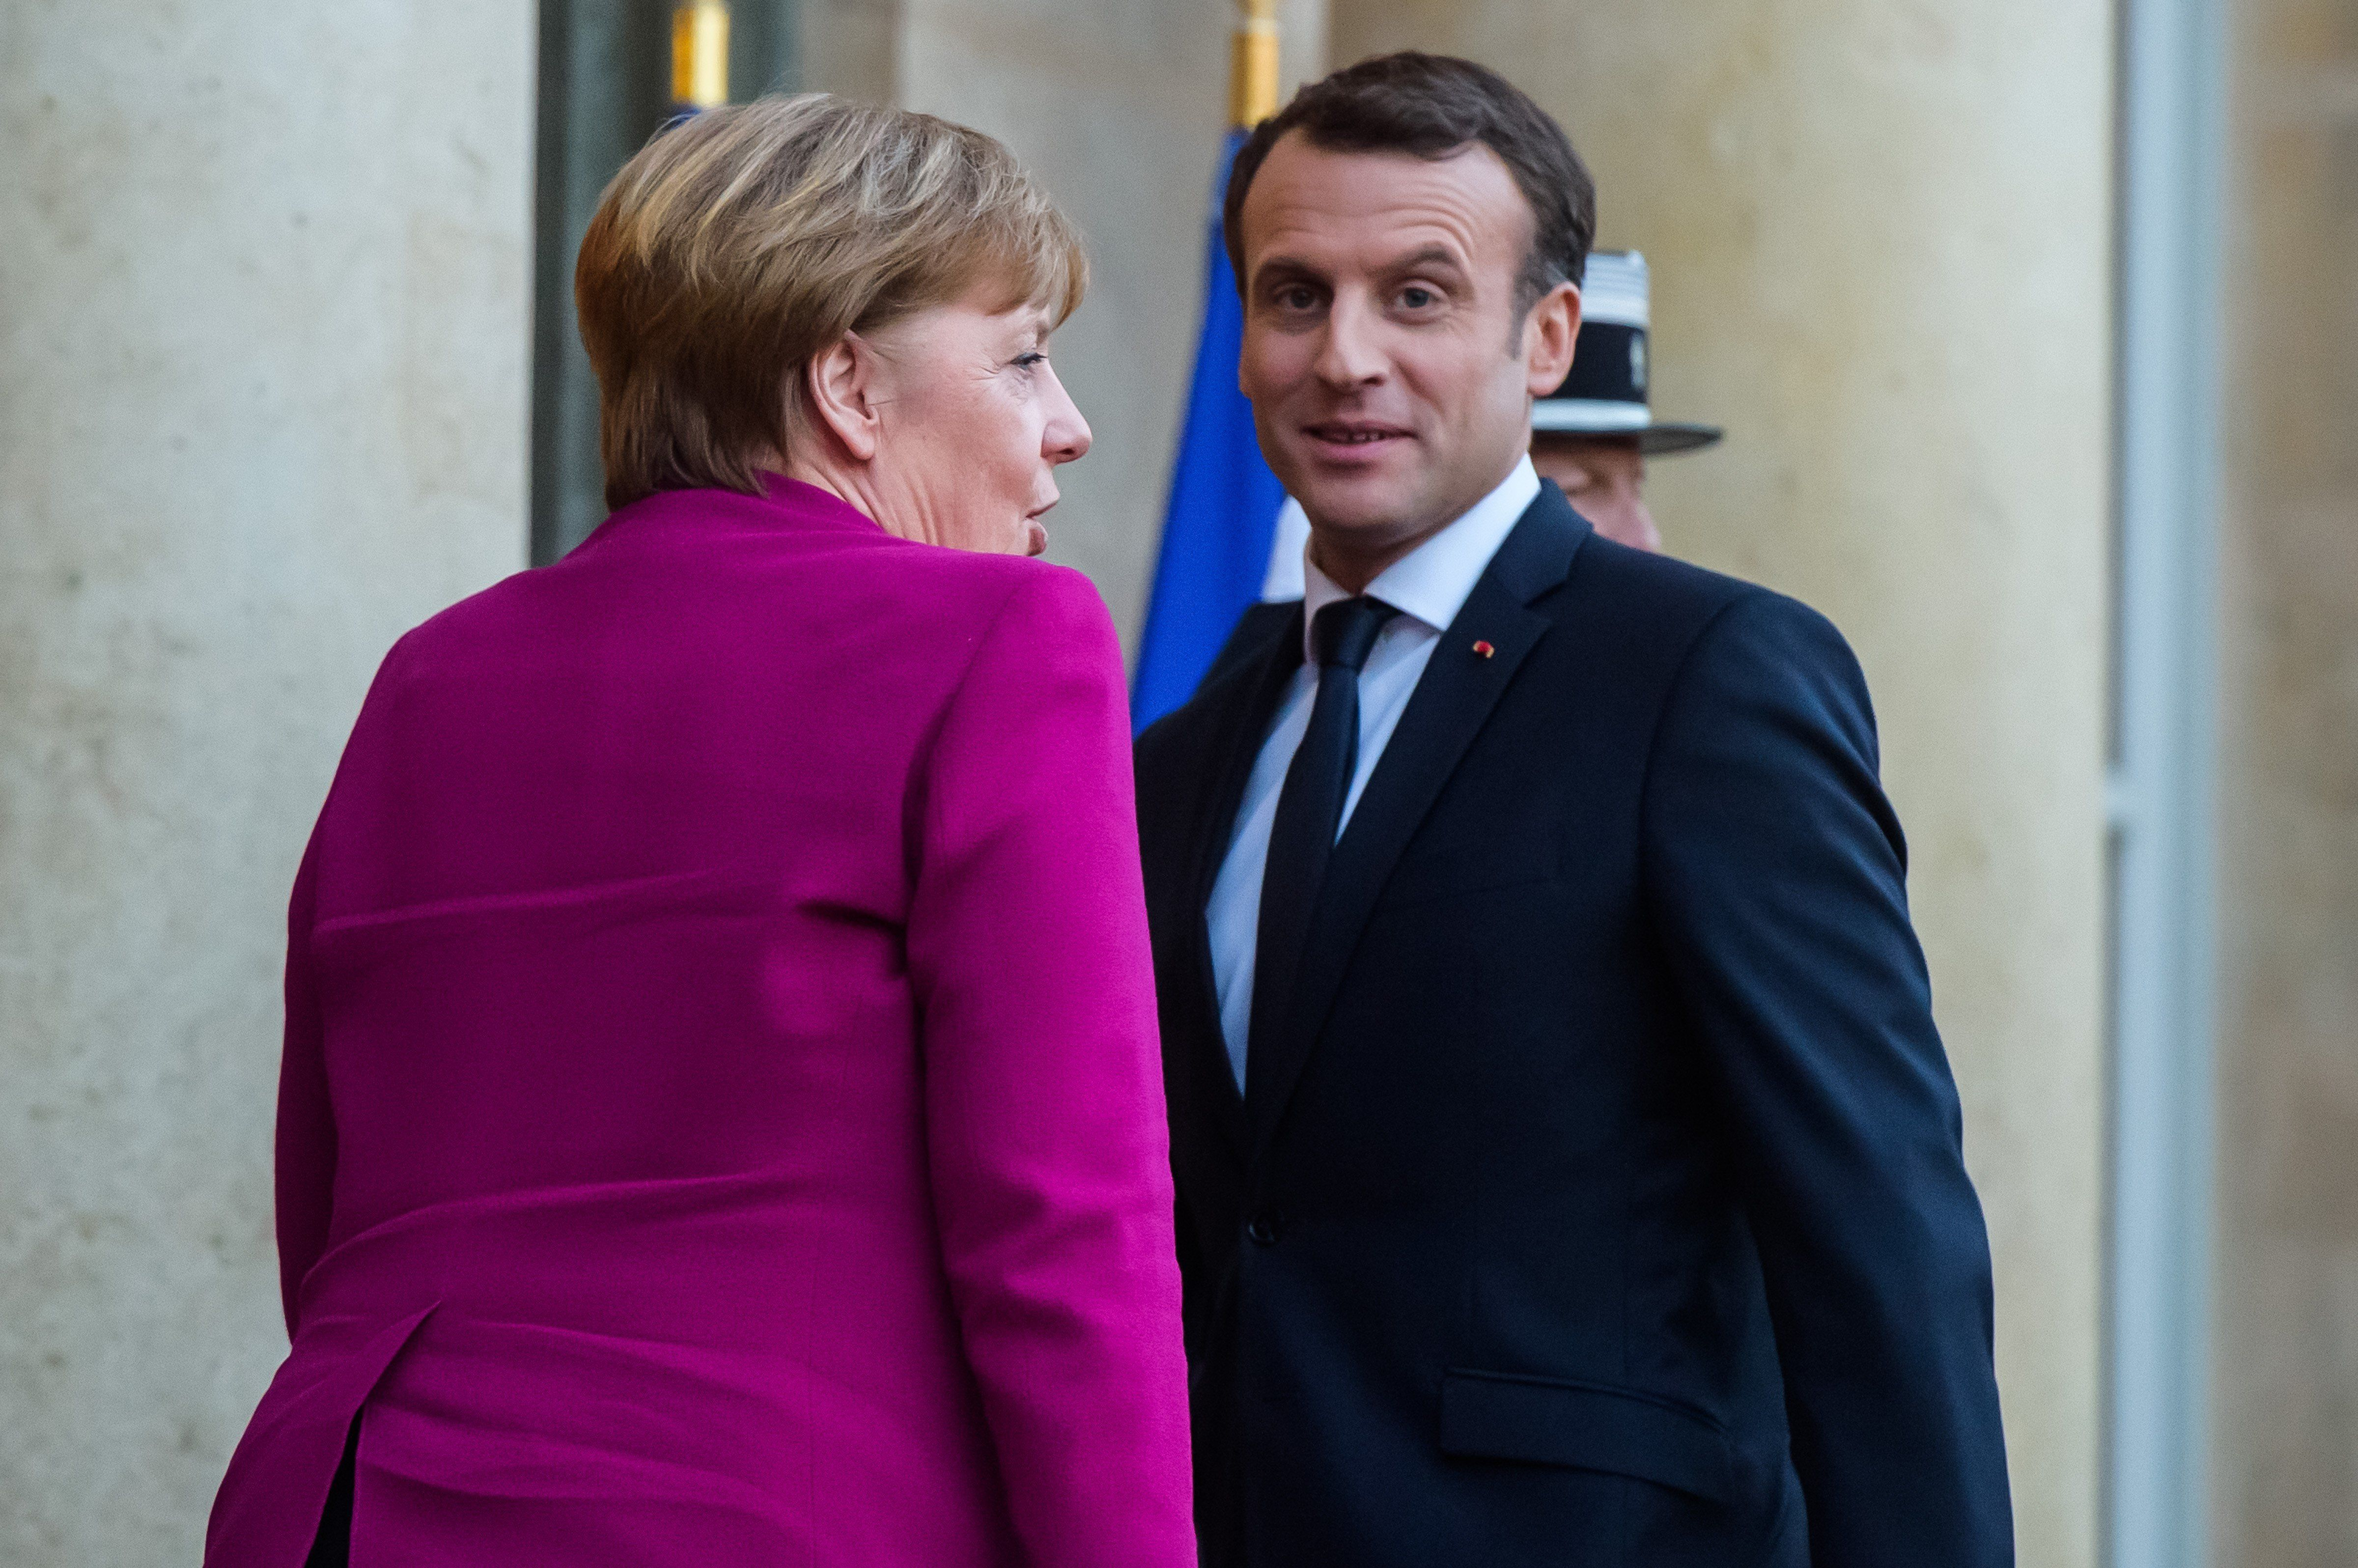 Spiegel: Μέρκελ και Μακρόν δεν θα παρουσιάσουν το σχέδιο για τη μεταρρύθμιση της ΕE στη διάσκεψη